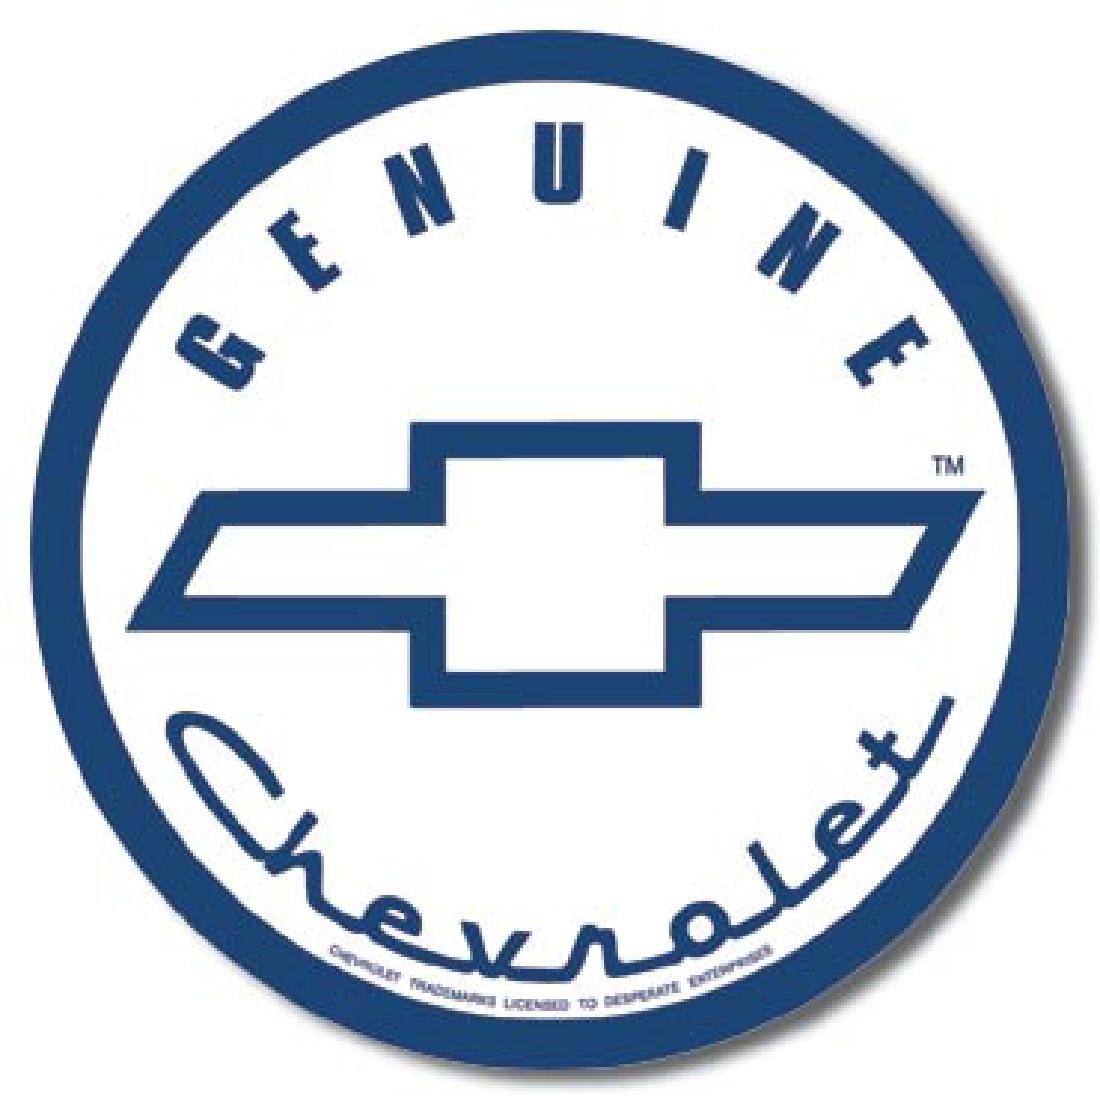 "CHEVROLET METAL SIGN 12"" ROUND"